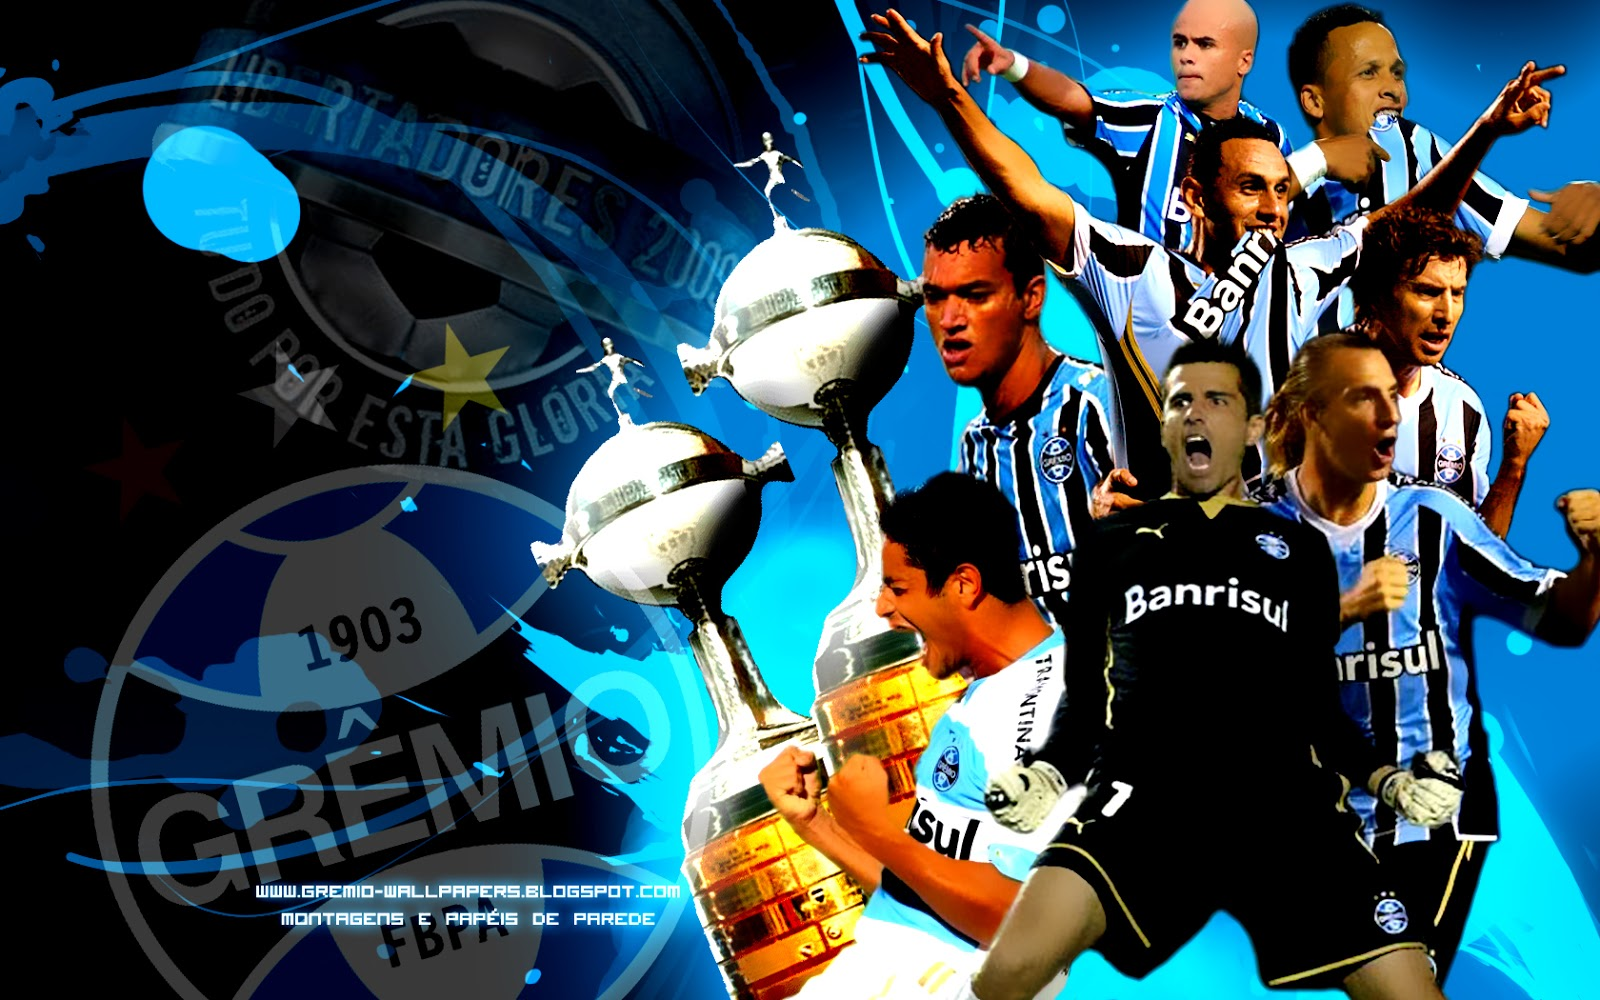 Papel de Parede do Grêmio wallpaper wallpapers screensave